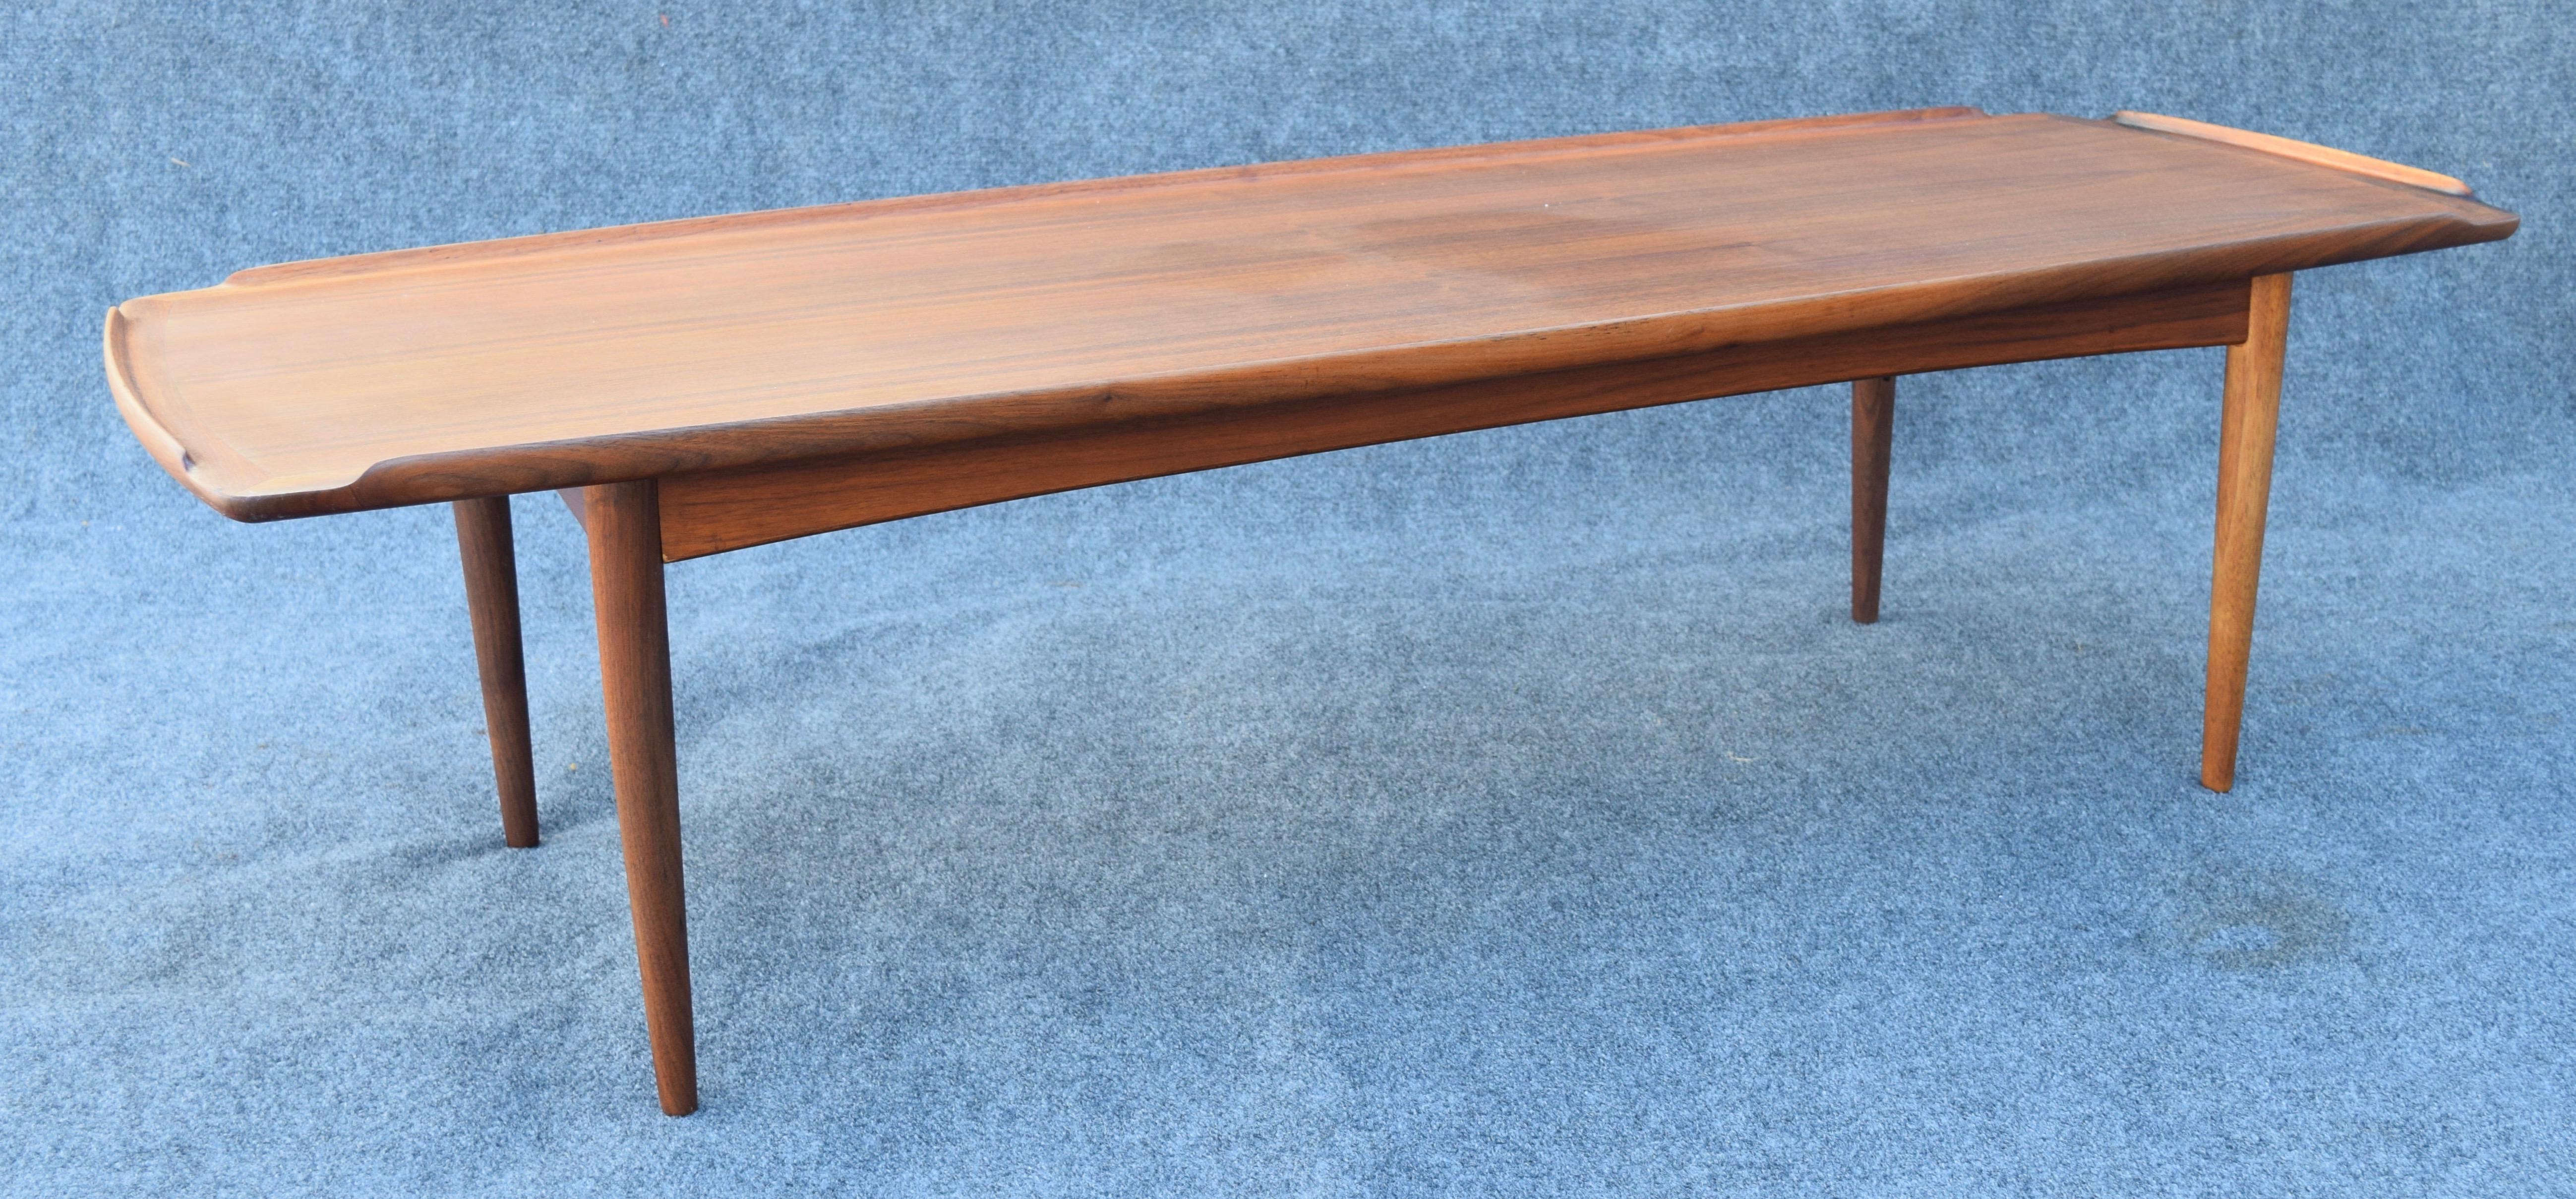 Poul Jensen For Selig Vintage Danish Modern Teak Coffee Table   Image 5 Of 9